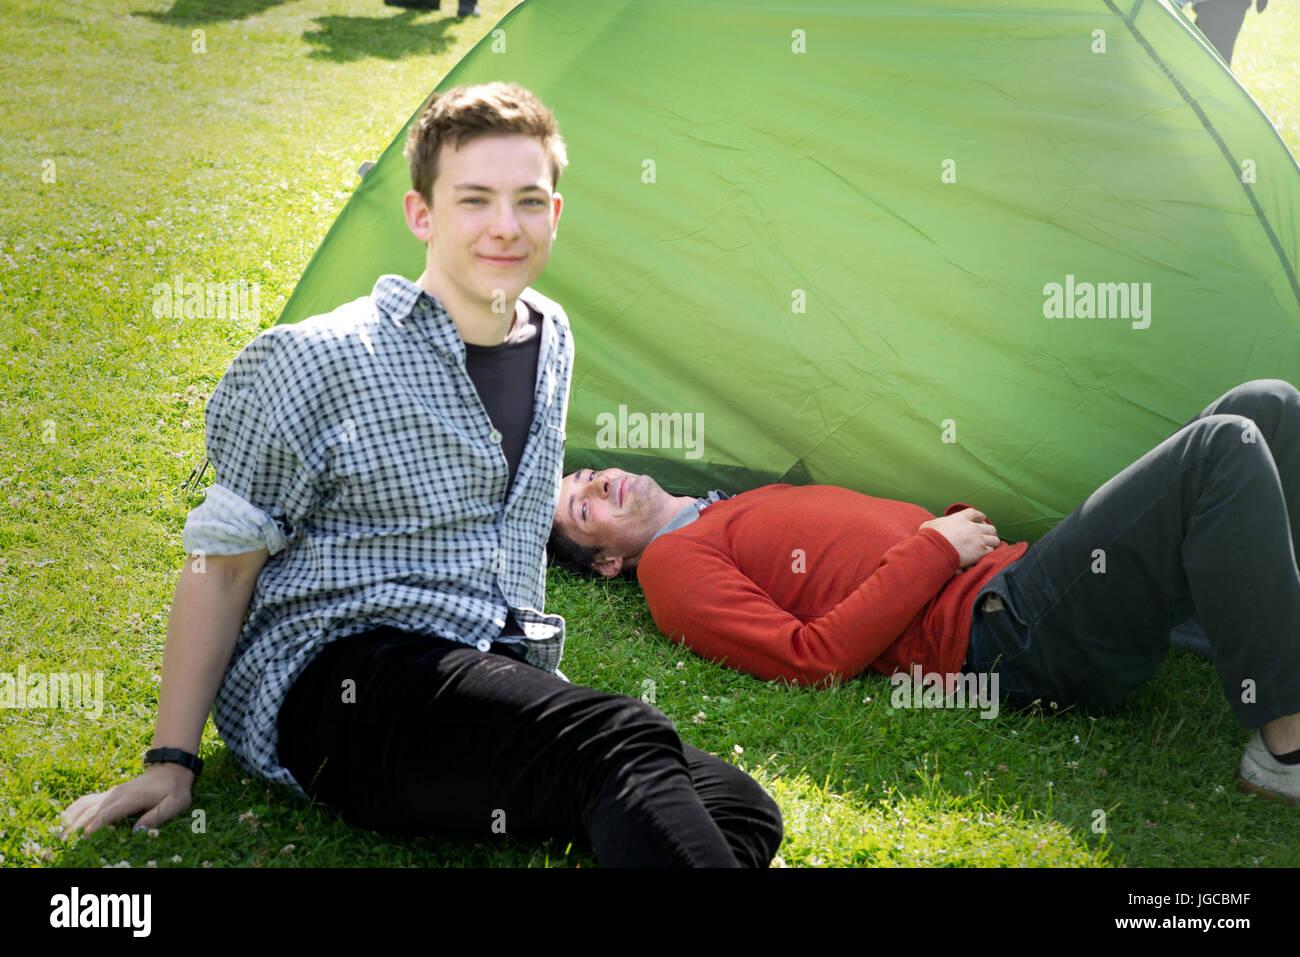 Sleep Inn - G20 - Stock Image